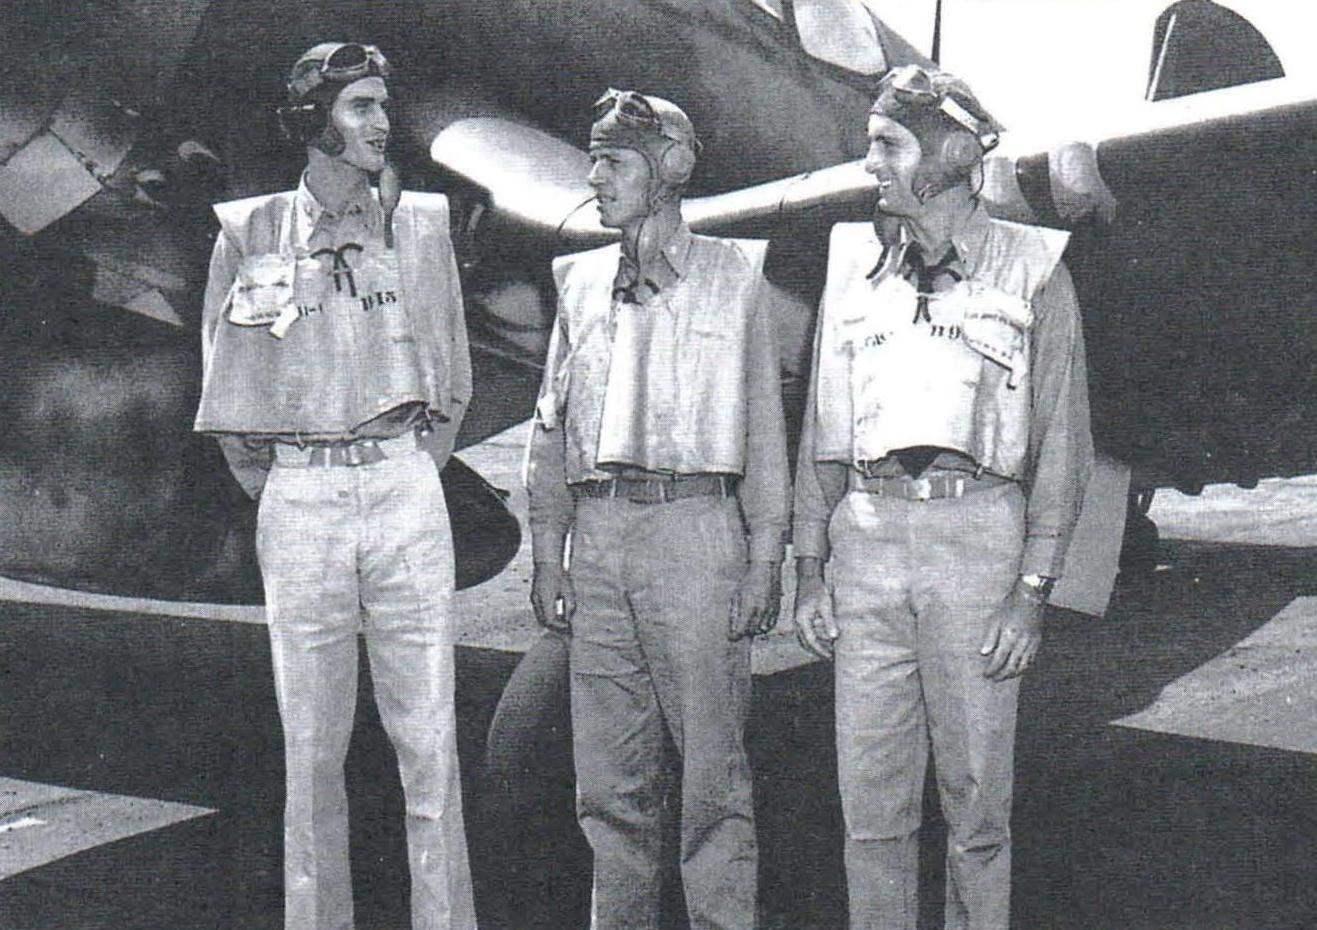 Асы палубной авиации, летавшие на «корсарах». Слева направо: Роджер Хедрик (9 побед), Джон Блэкберн (11 побед), Айра Кипфорд (17 побед)